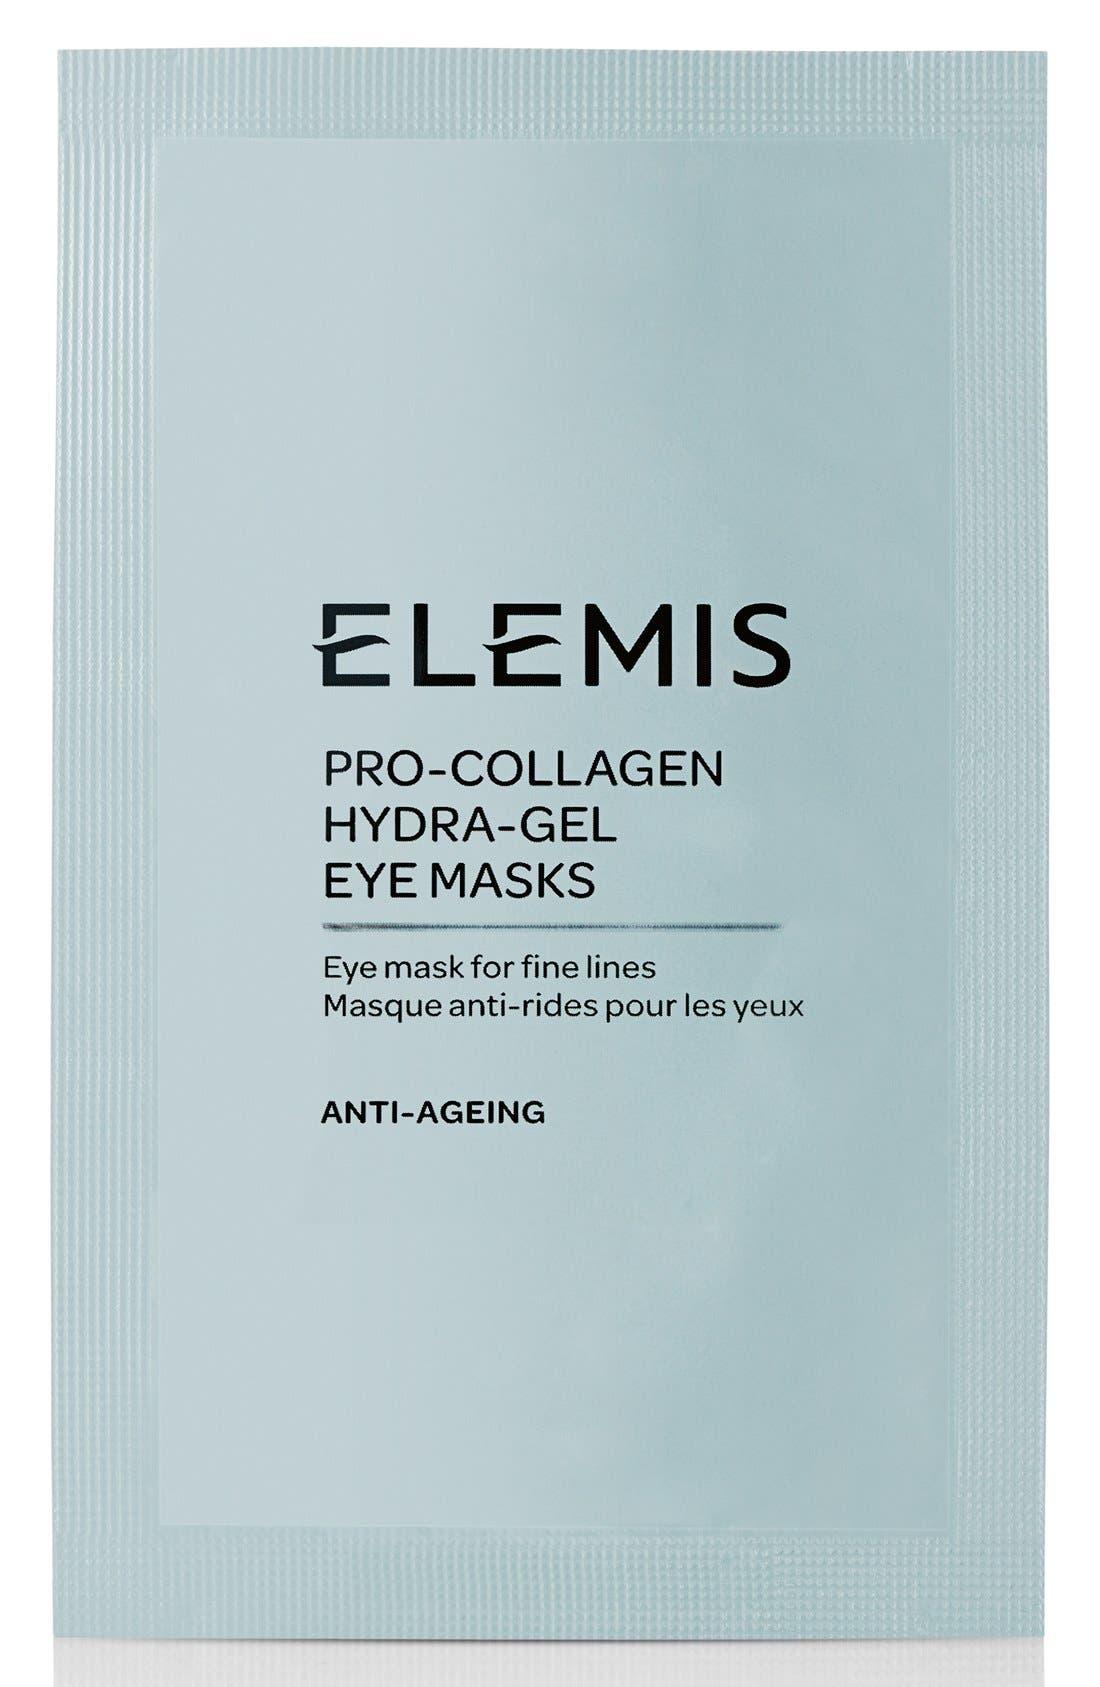 Pro-Collagen Hydra-Gel Eye Mask